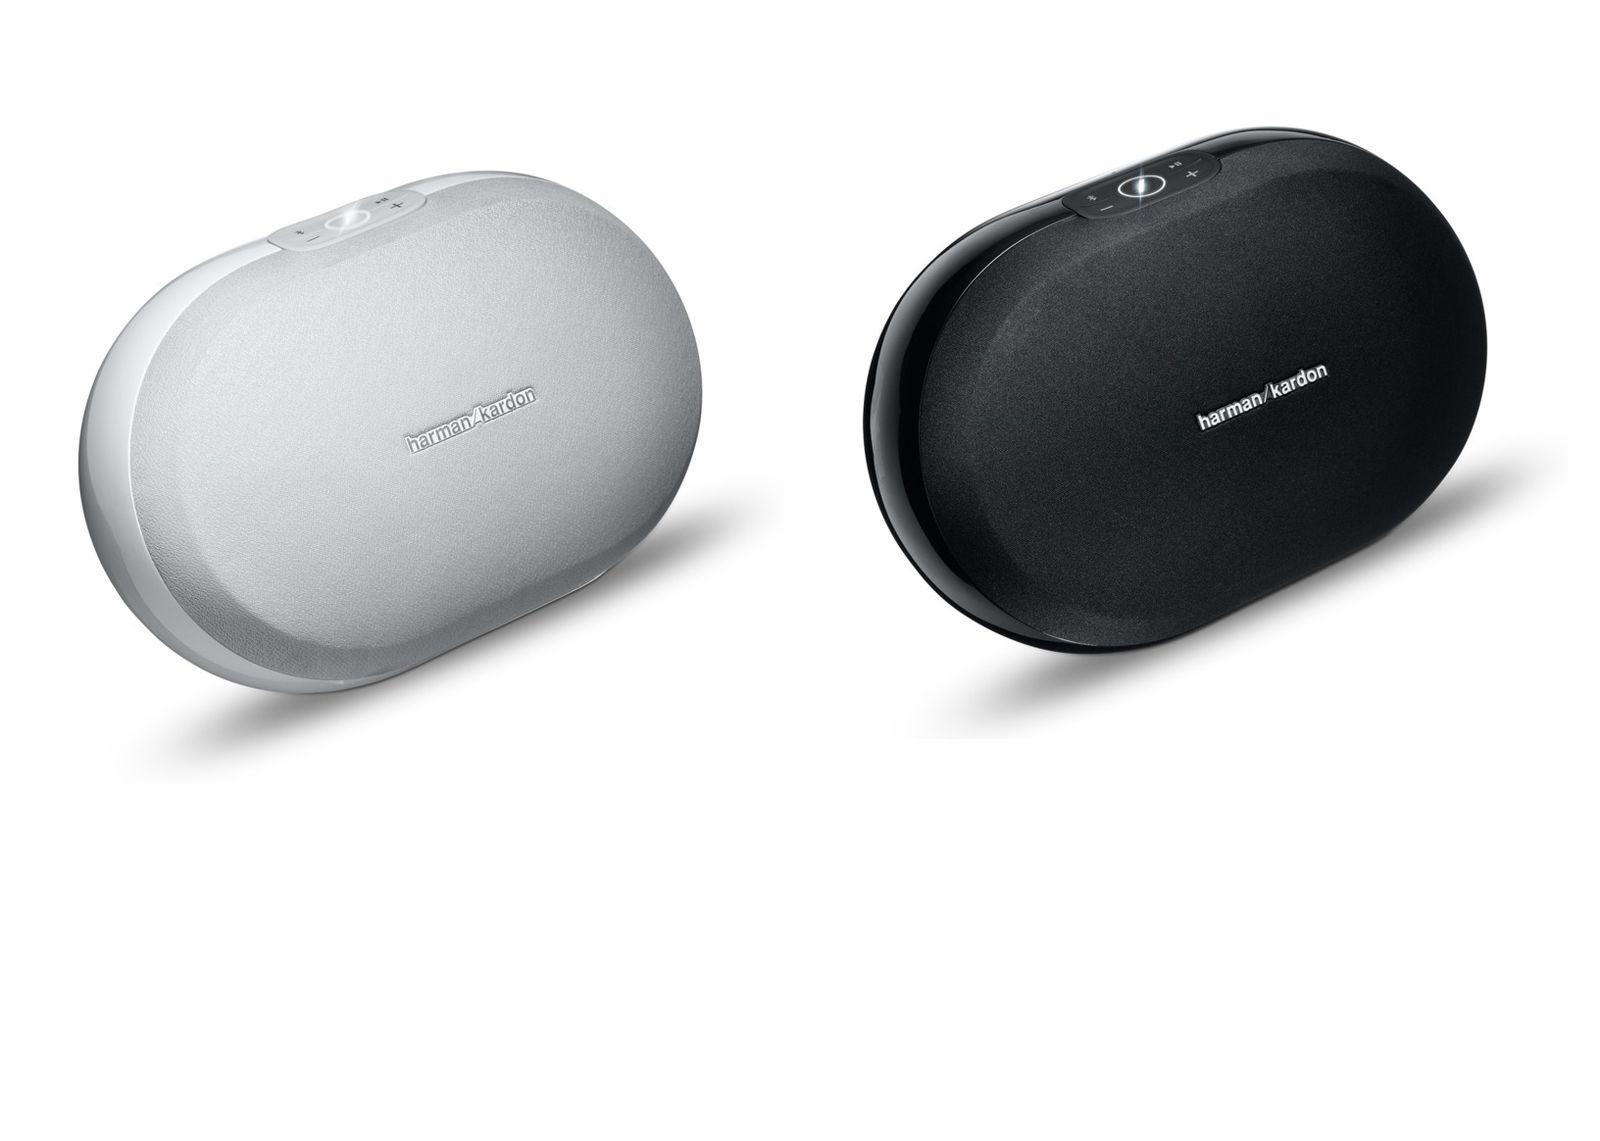 Harman Kardon Omni 20 Wireless Hd Home Audio System Refurb Https Uxshops Com Buy Harman Kardon Omni 2 Harman Kardon Wireless Audio Audio System